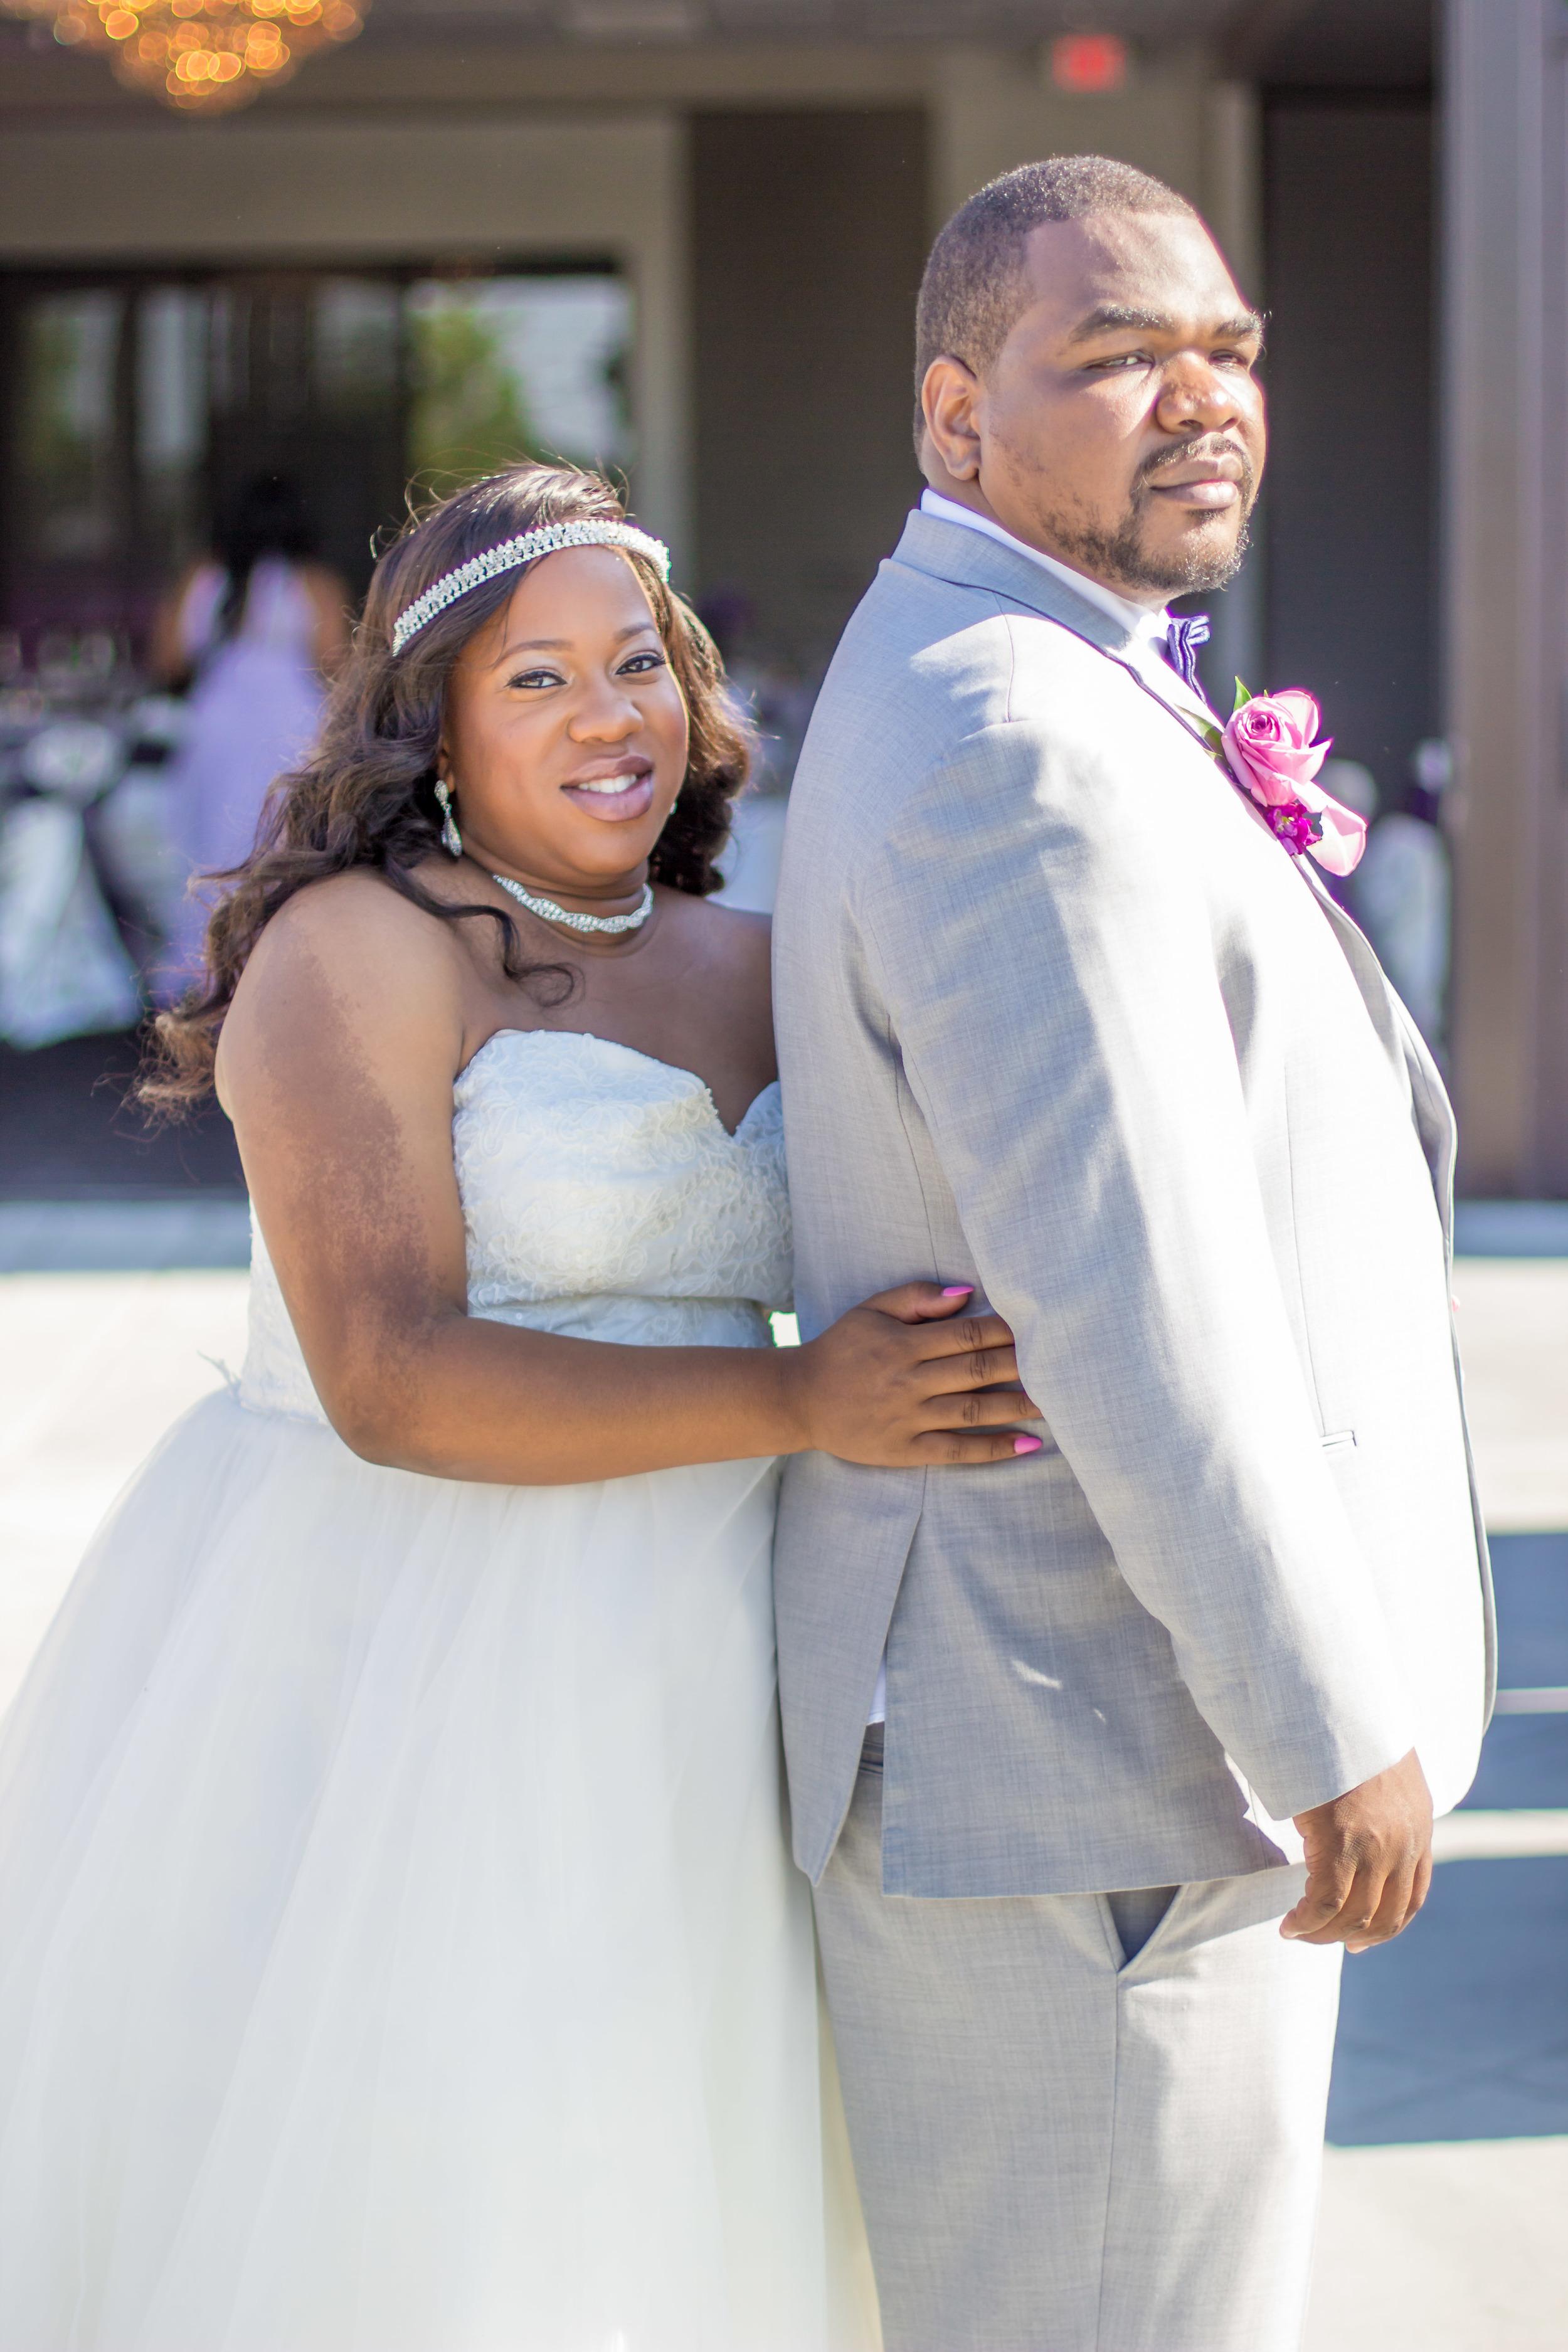 Kendra + Terrance | Greenville NC Wedding | Eastern + Greenville NC Photographer | Bryant Tyson Photography | www.memoriesbybryant.com